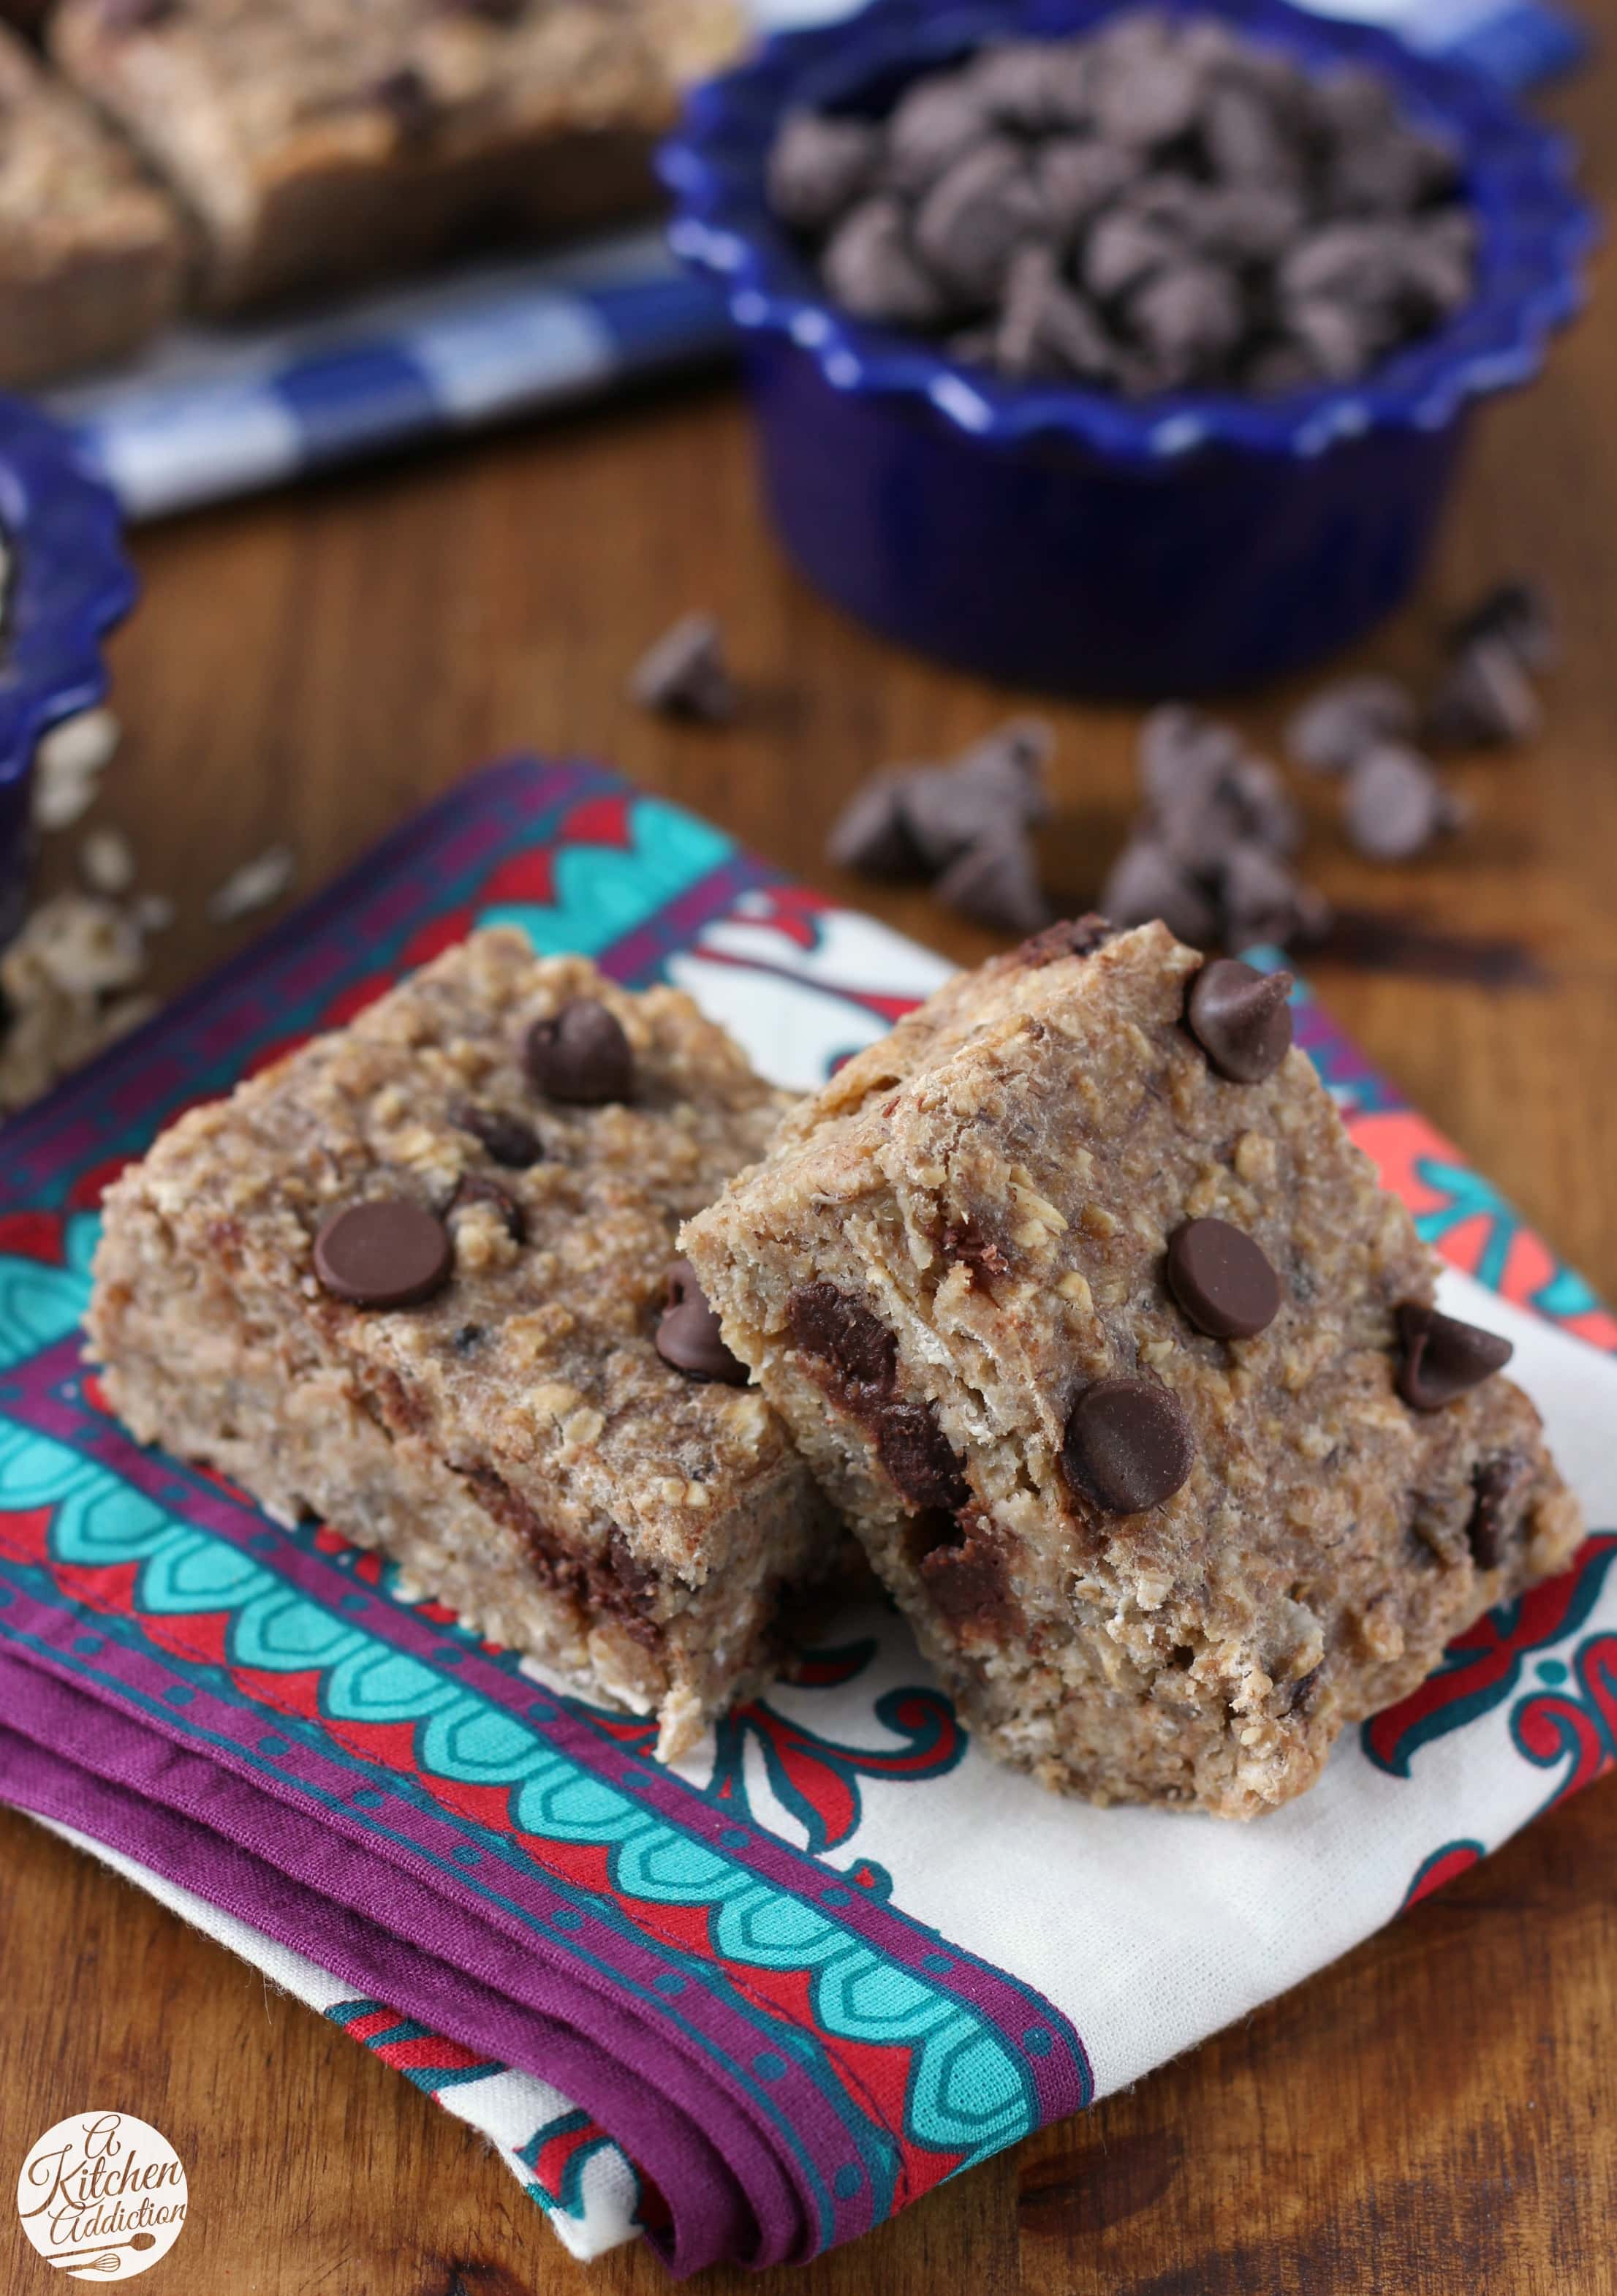 Chocolate Chip Banana Breakfast Bars Recipe from A Kitchen Addiction